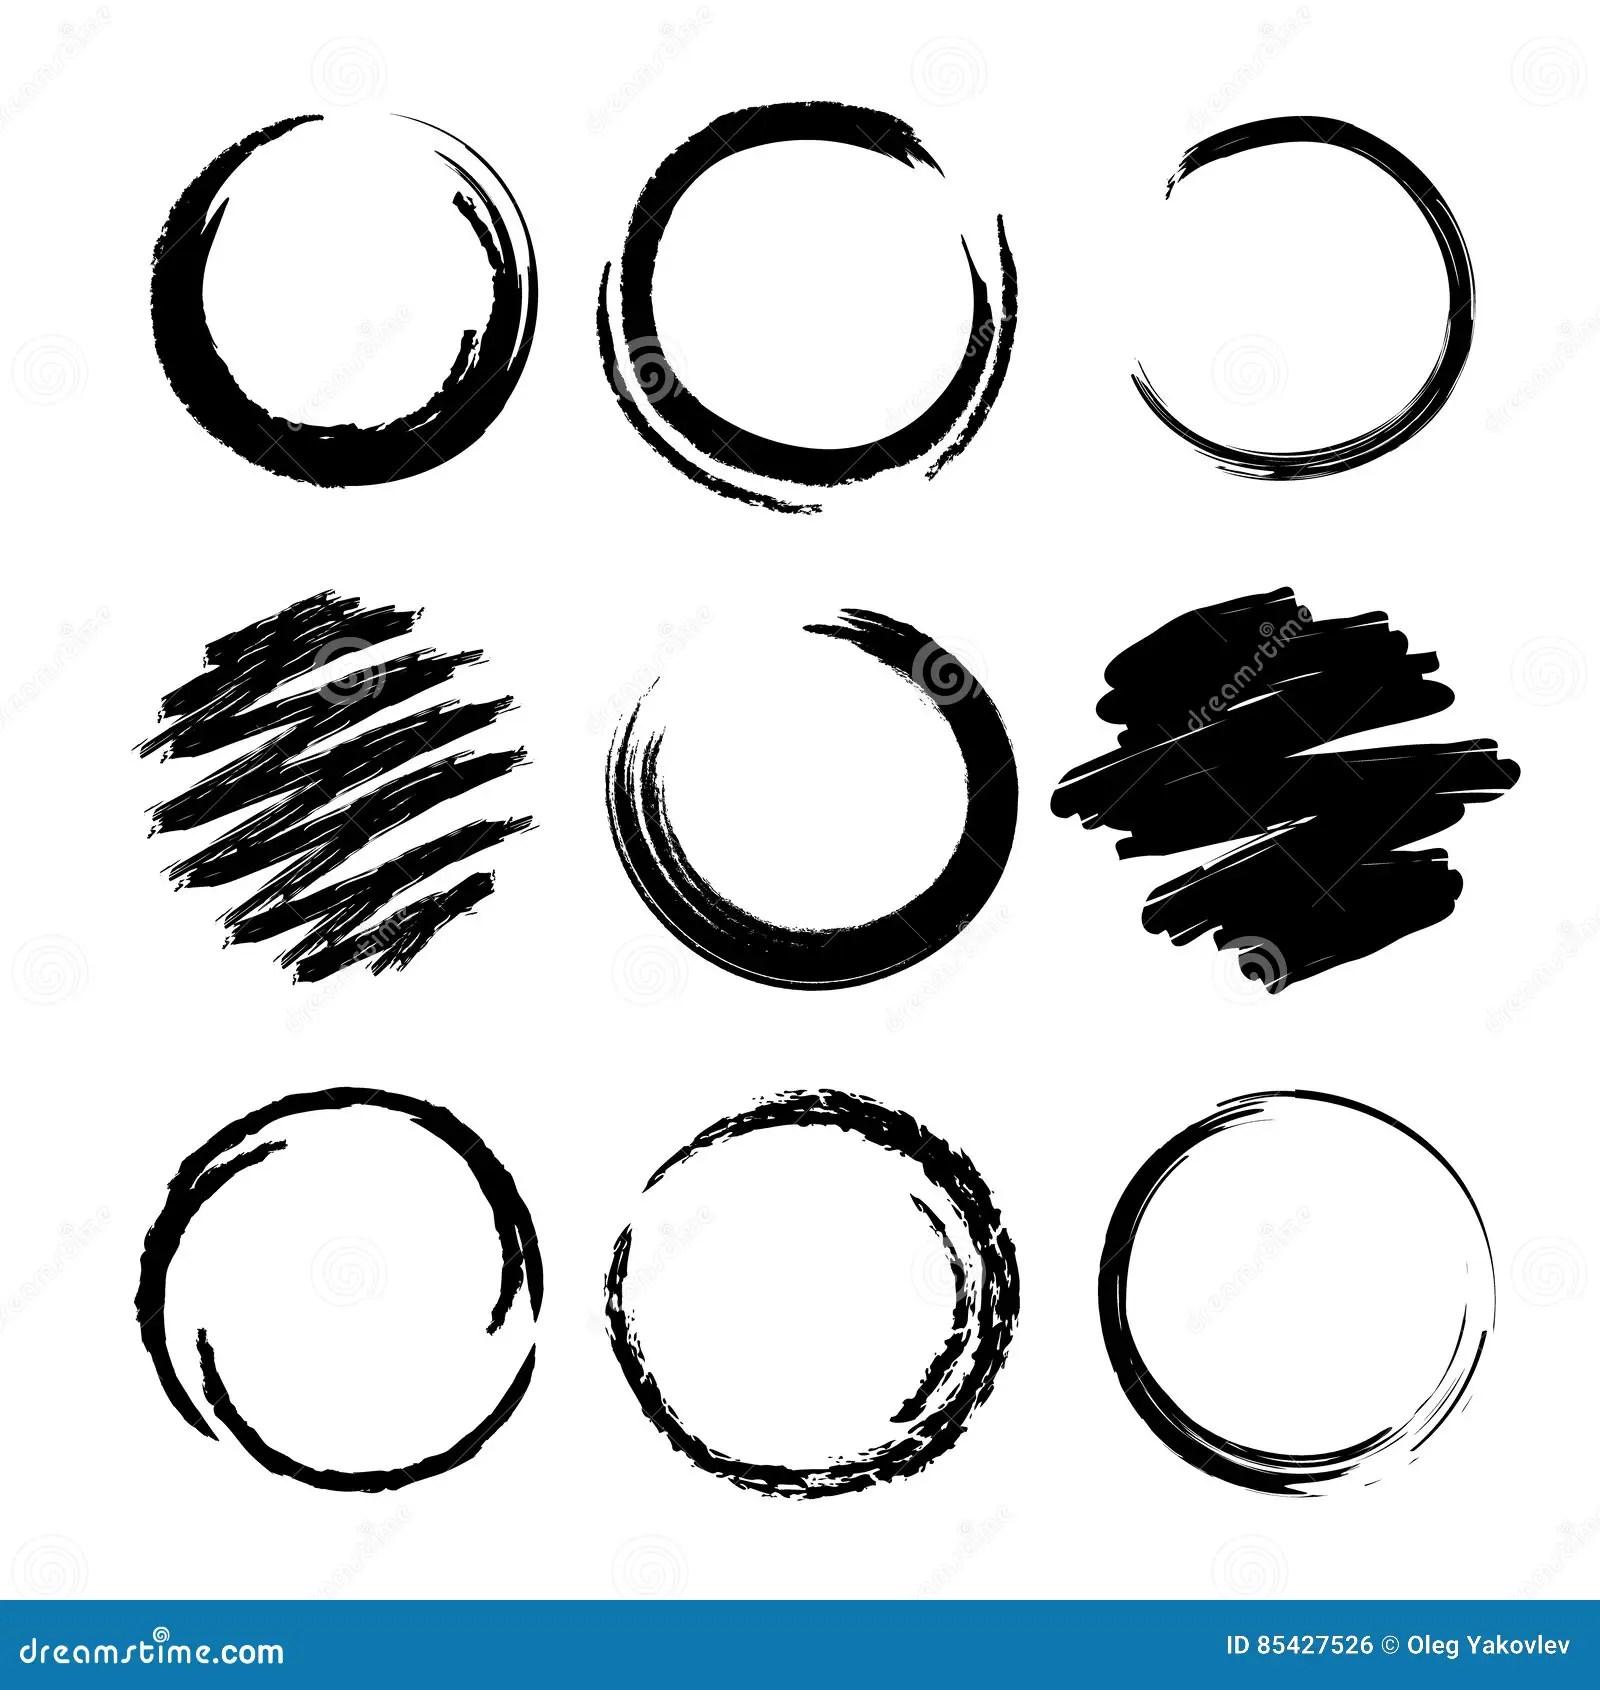 hight resolution of grunge circle brush strokes